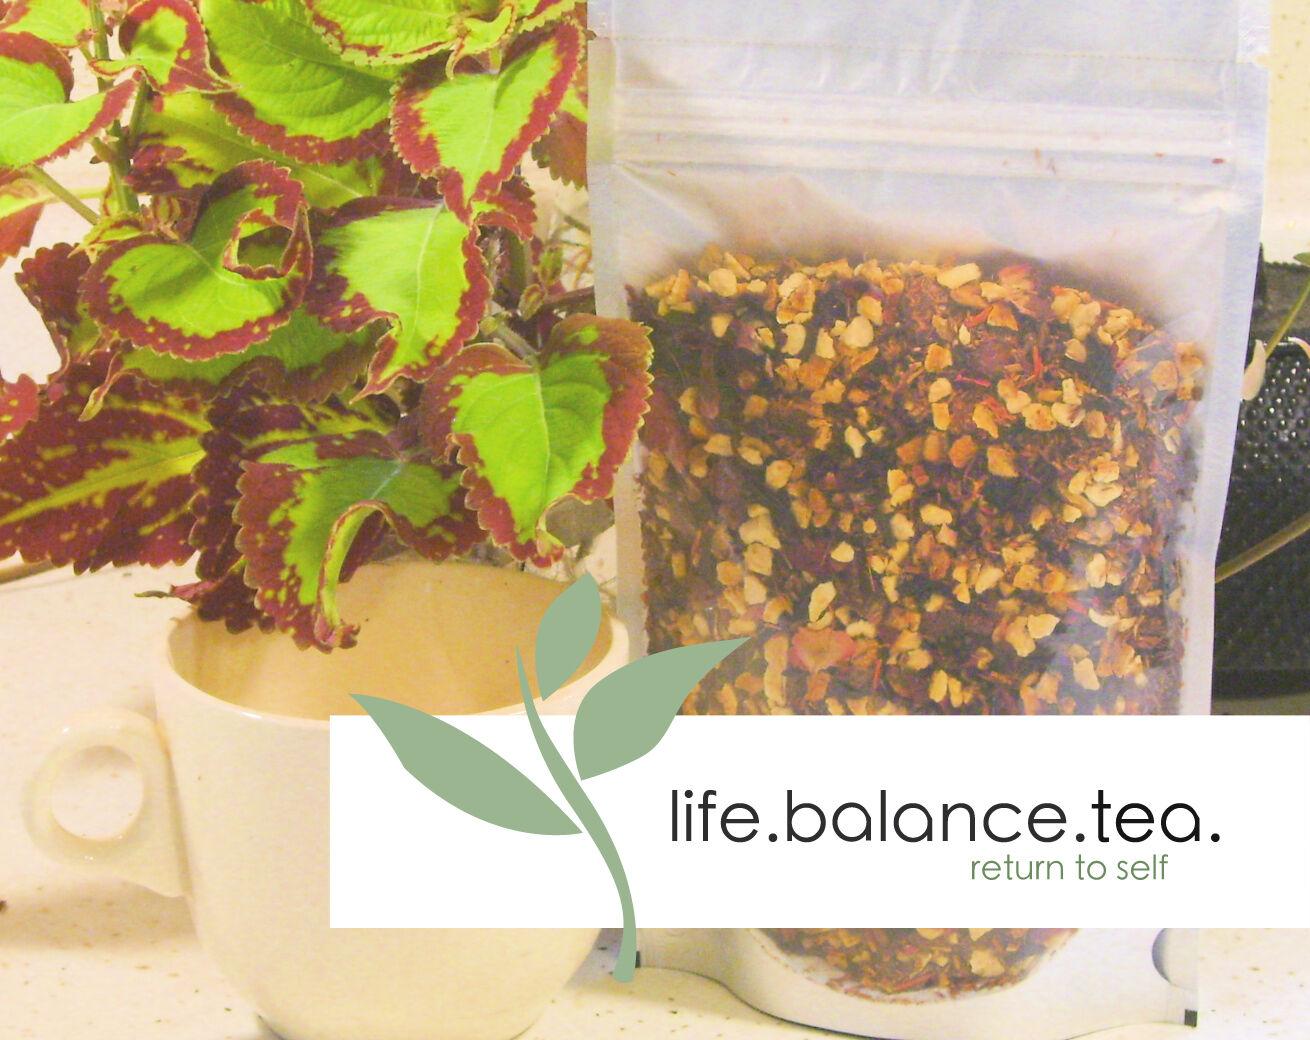 lifebalancetea